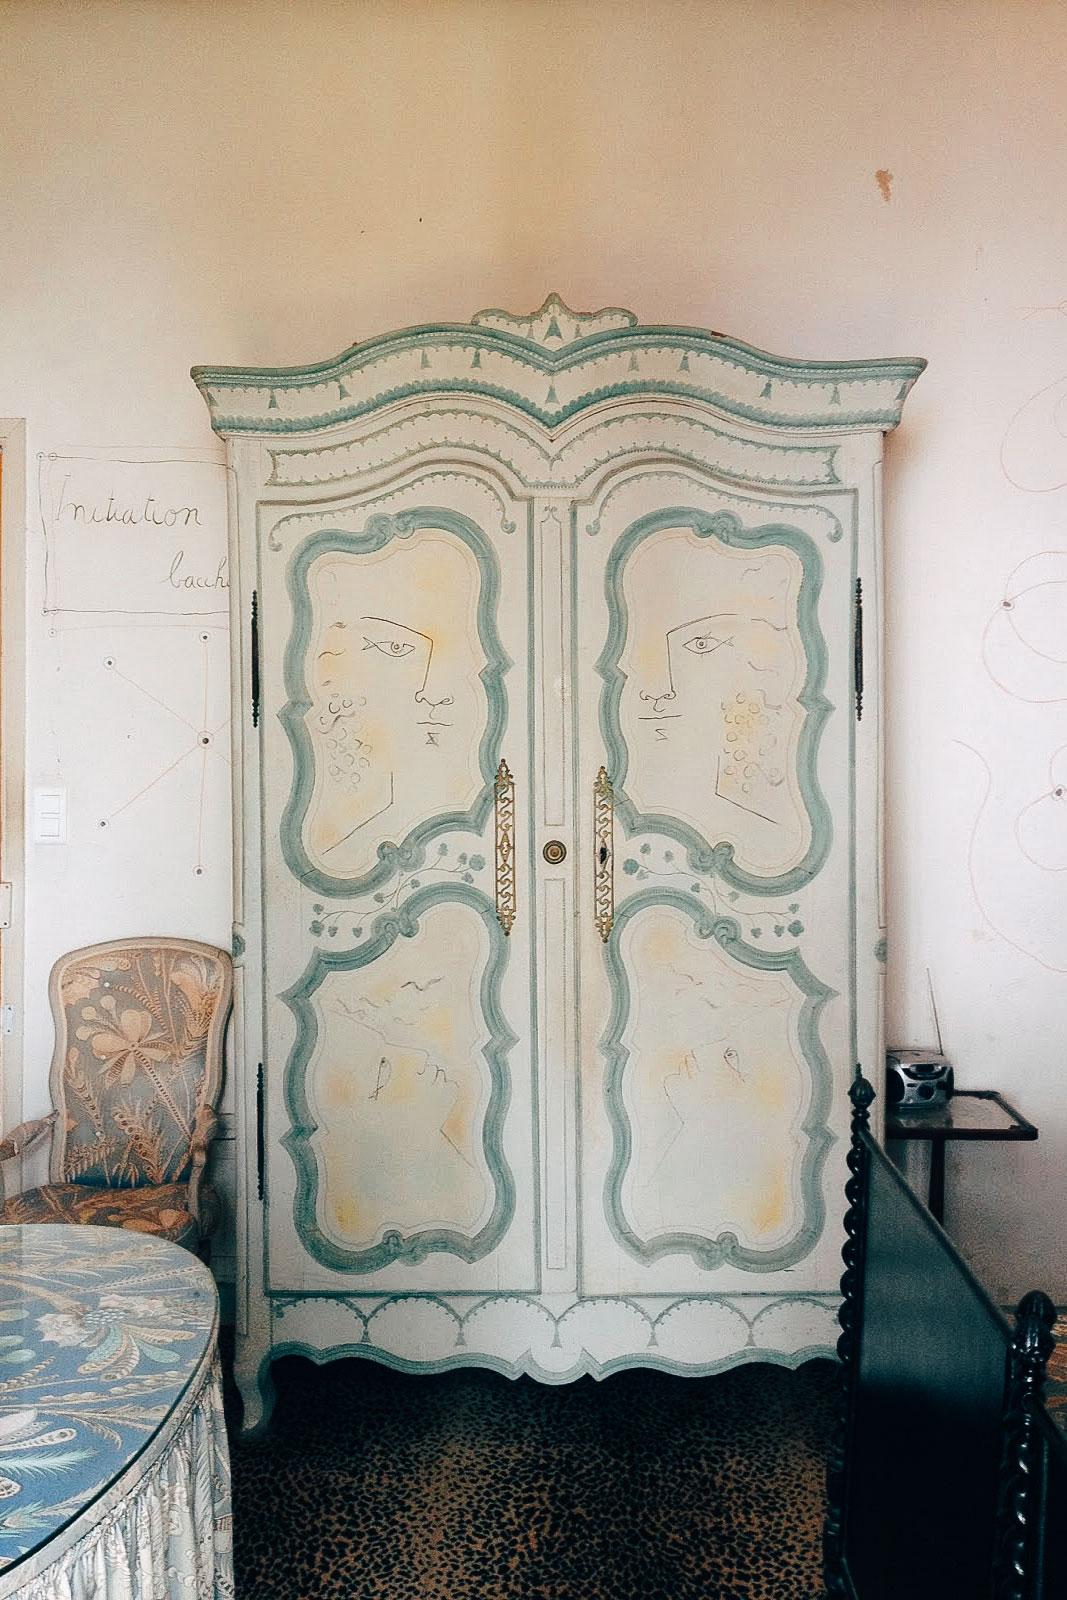 Santo Sospir: The Tattooed Villa